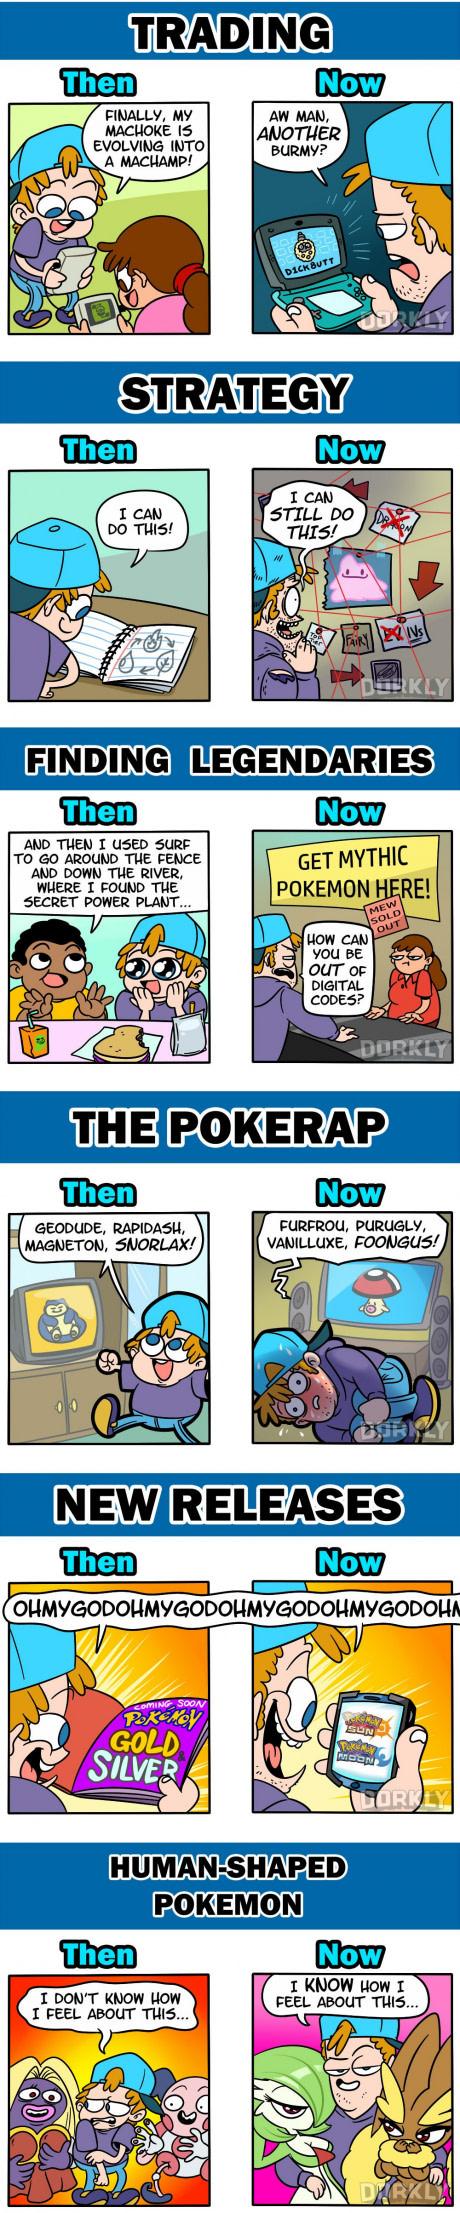 Pokemon Then Vs Now Pokemon Pokemon Memes Pokemon Funny